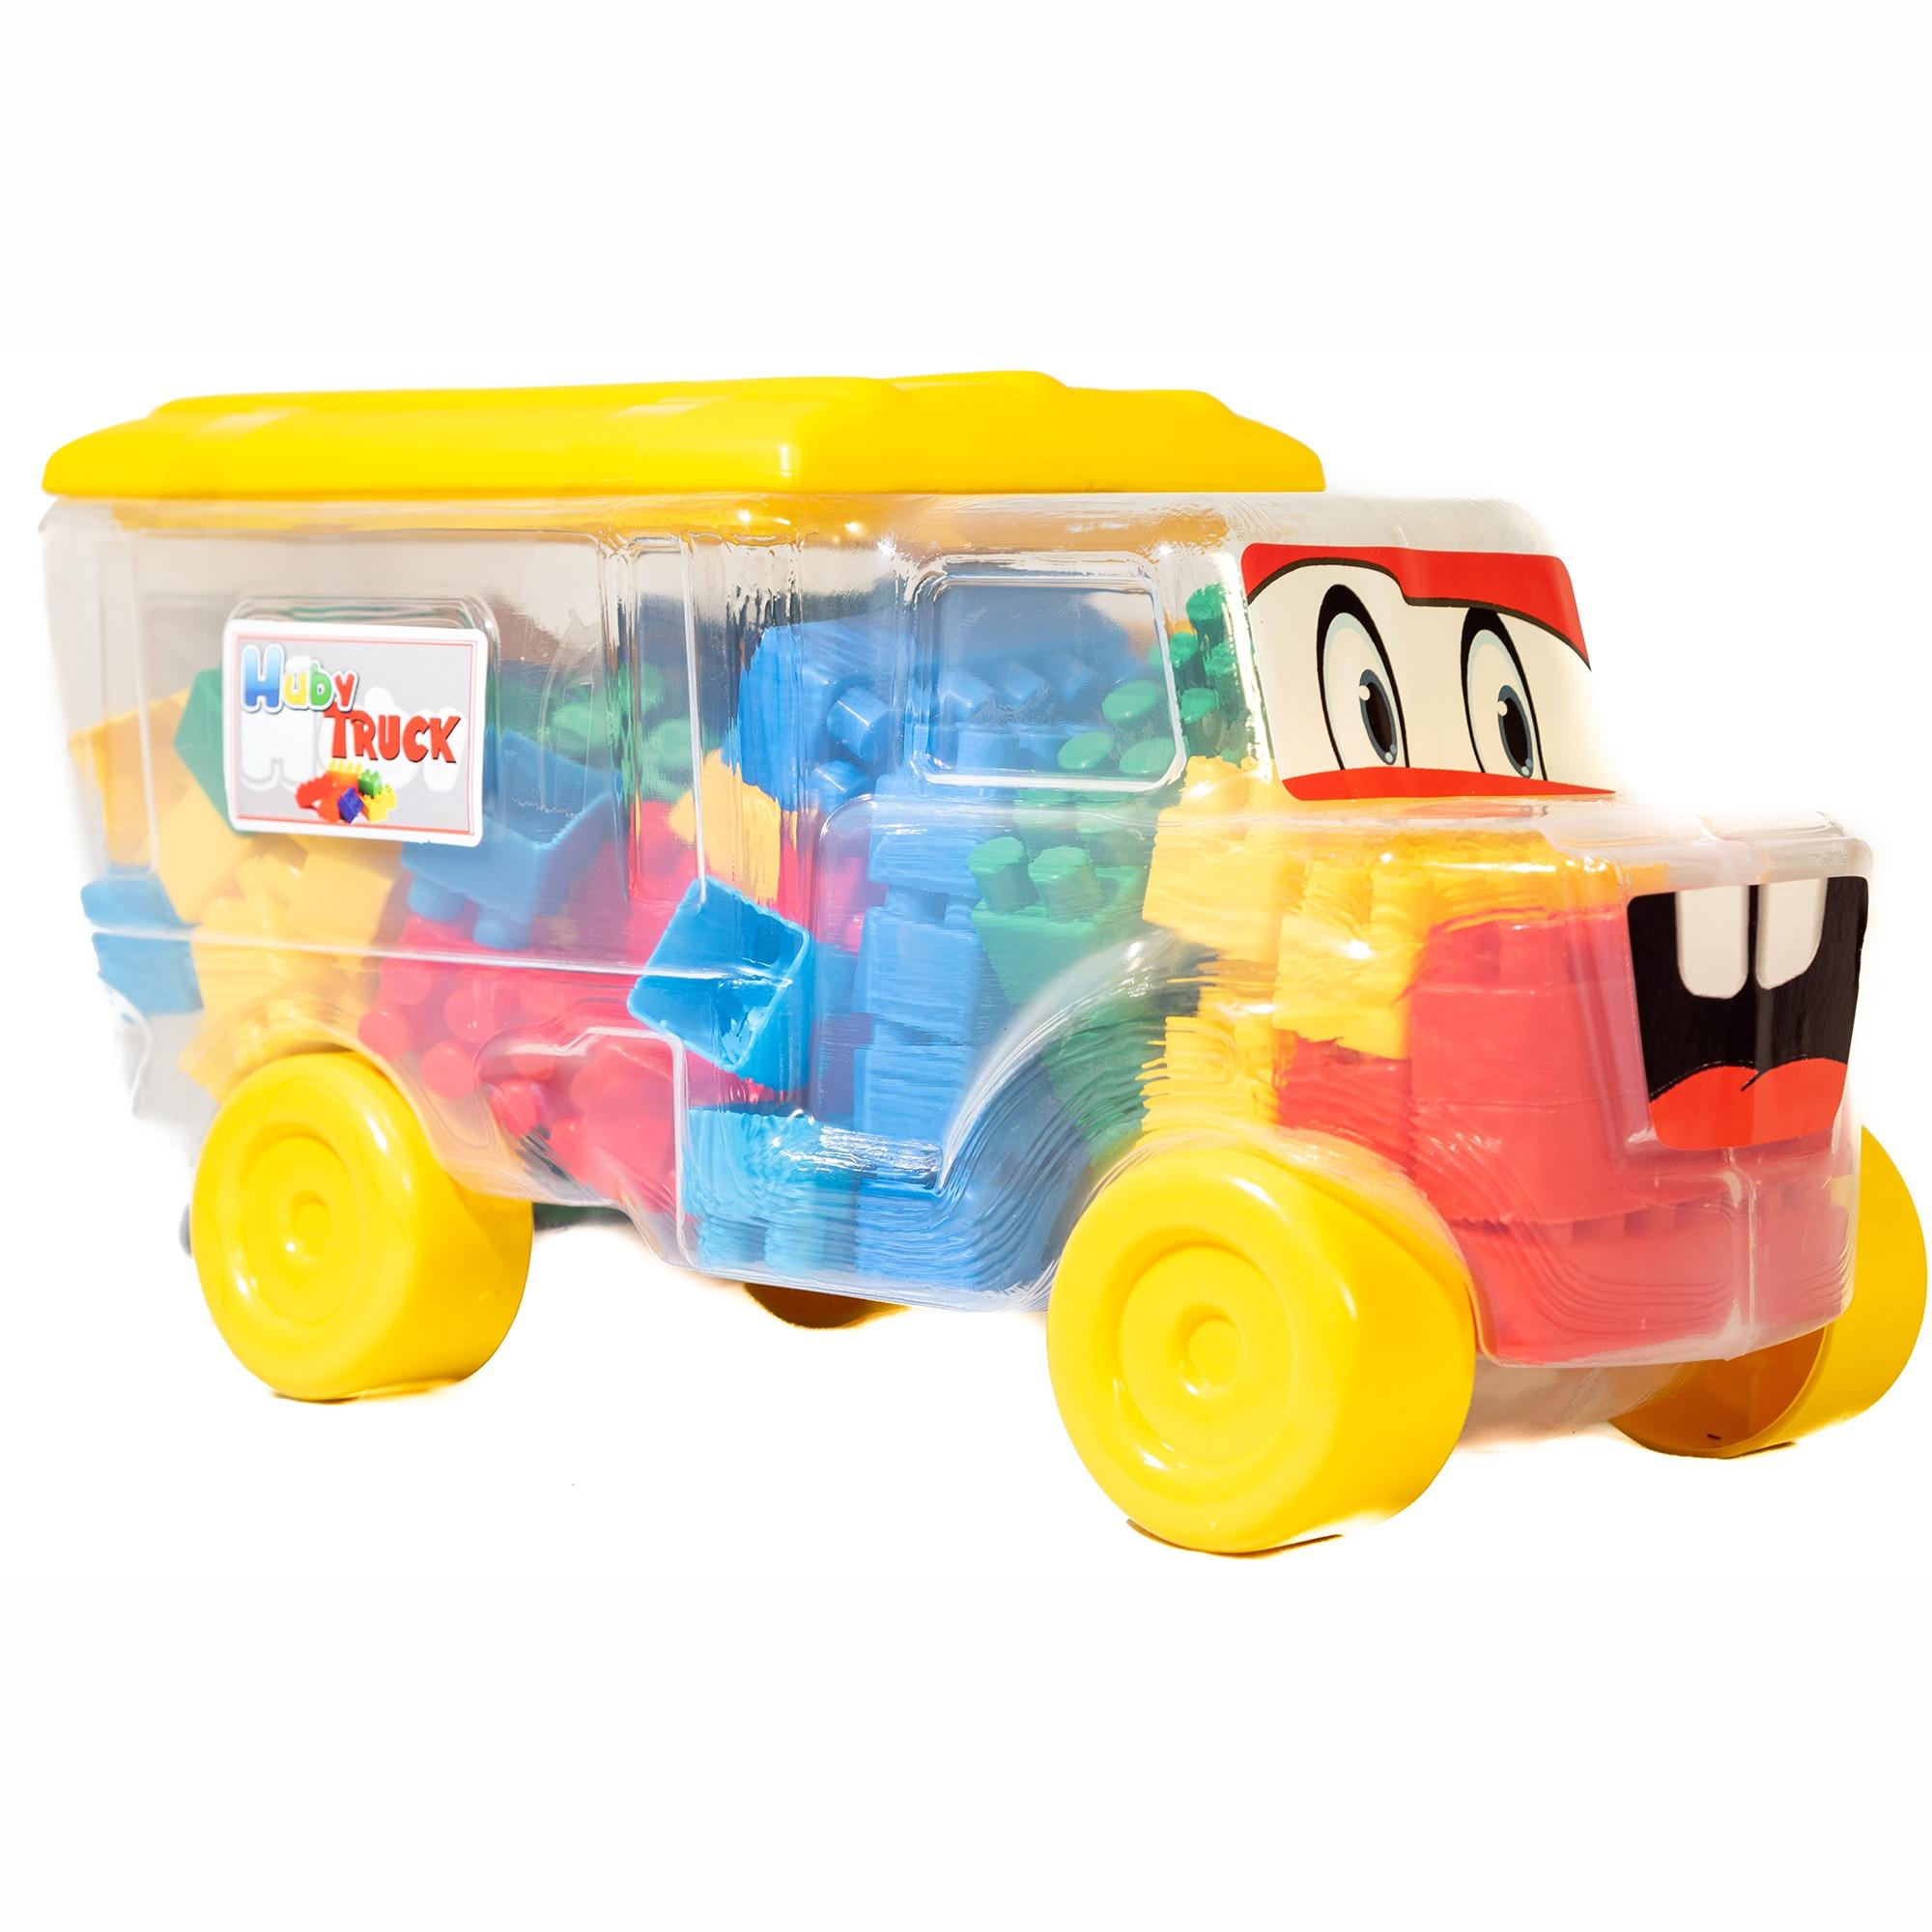 Fotografie Set constructie - Camion cu cuburi, galben